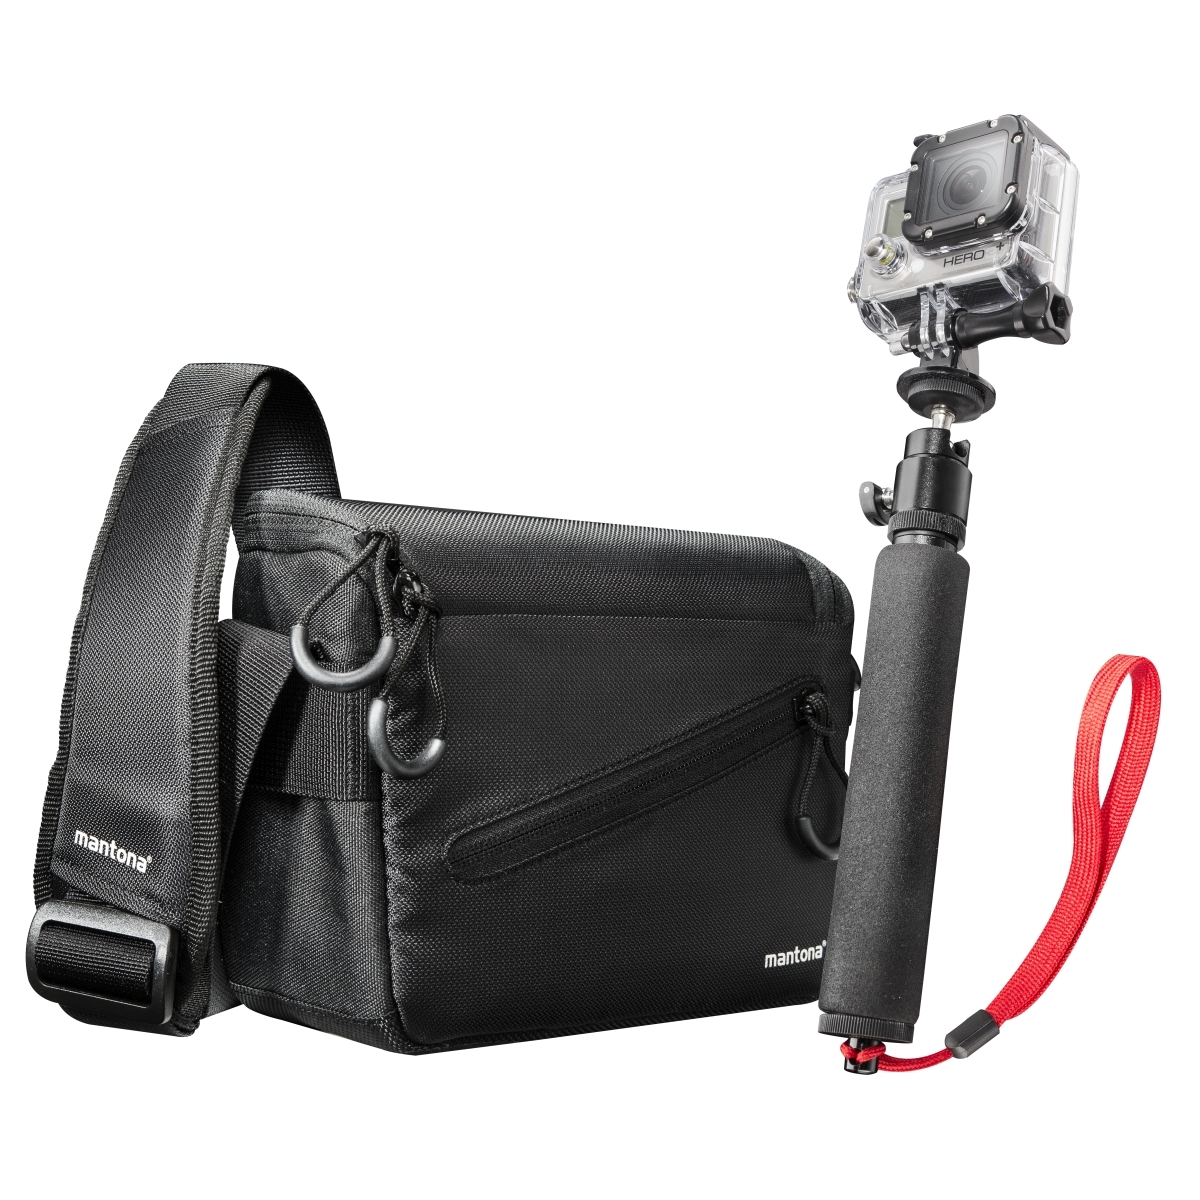 Mantona Irit bag for GoPro incl hand tripod